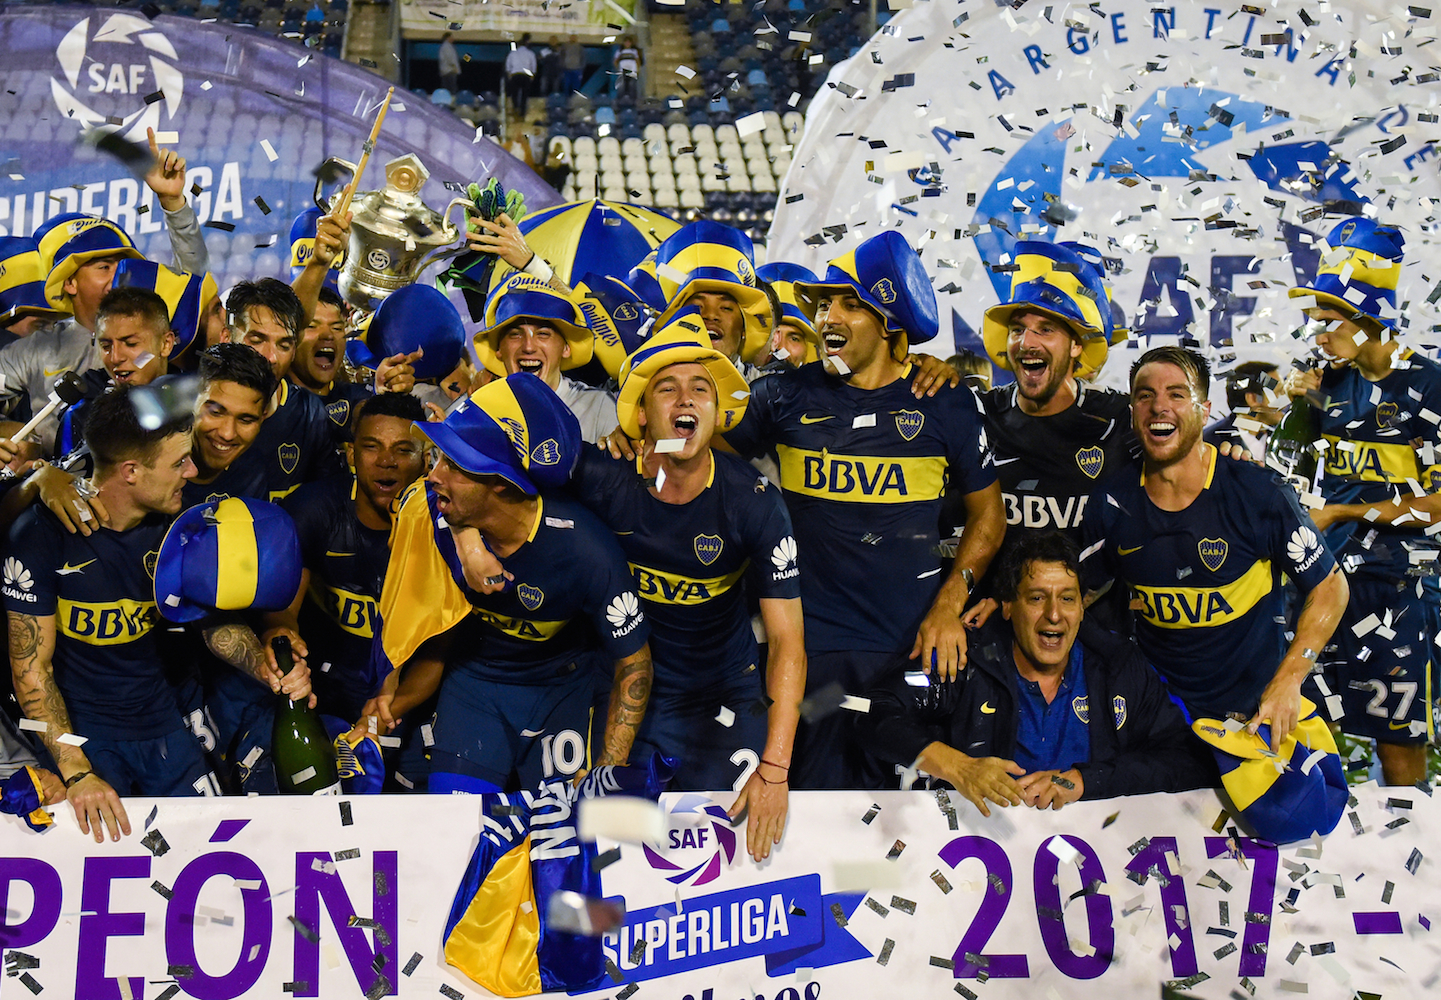 TRAILER: 'Boca Juniors Confidencial' Takes You Into the Locker Room of Argentina's Soccer Powerhouse